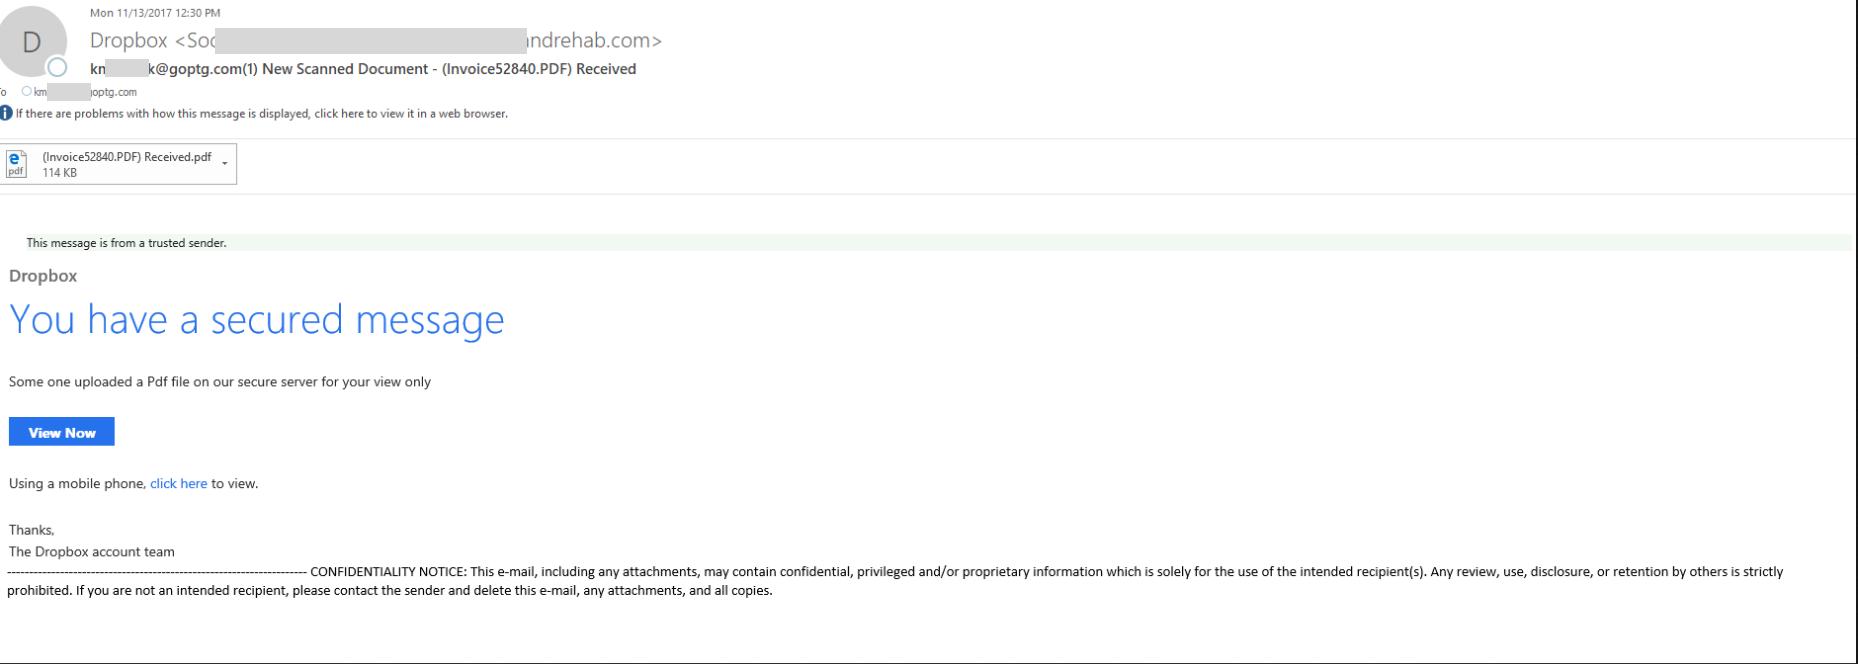 Dropbox Phishing Attempt